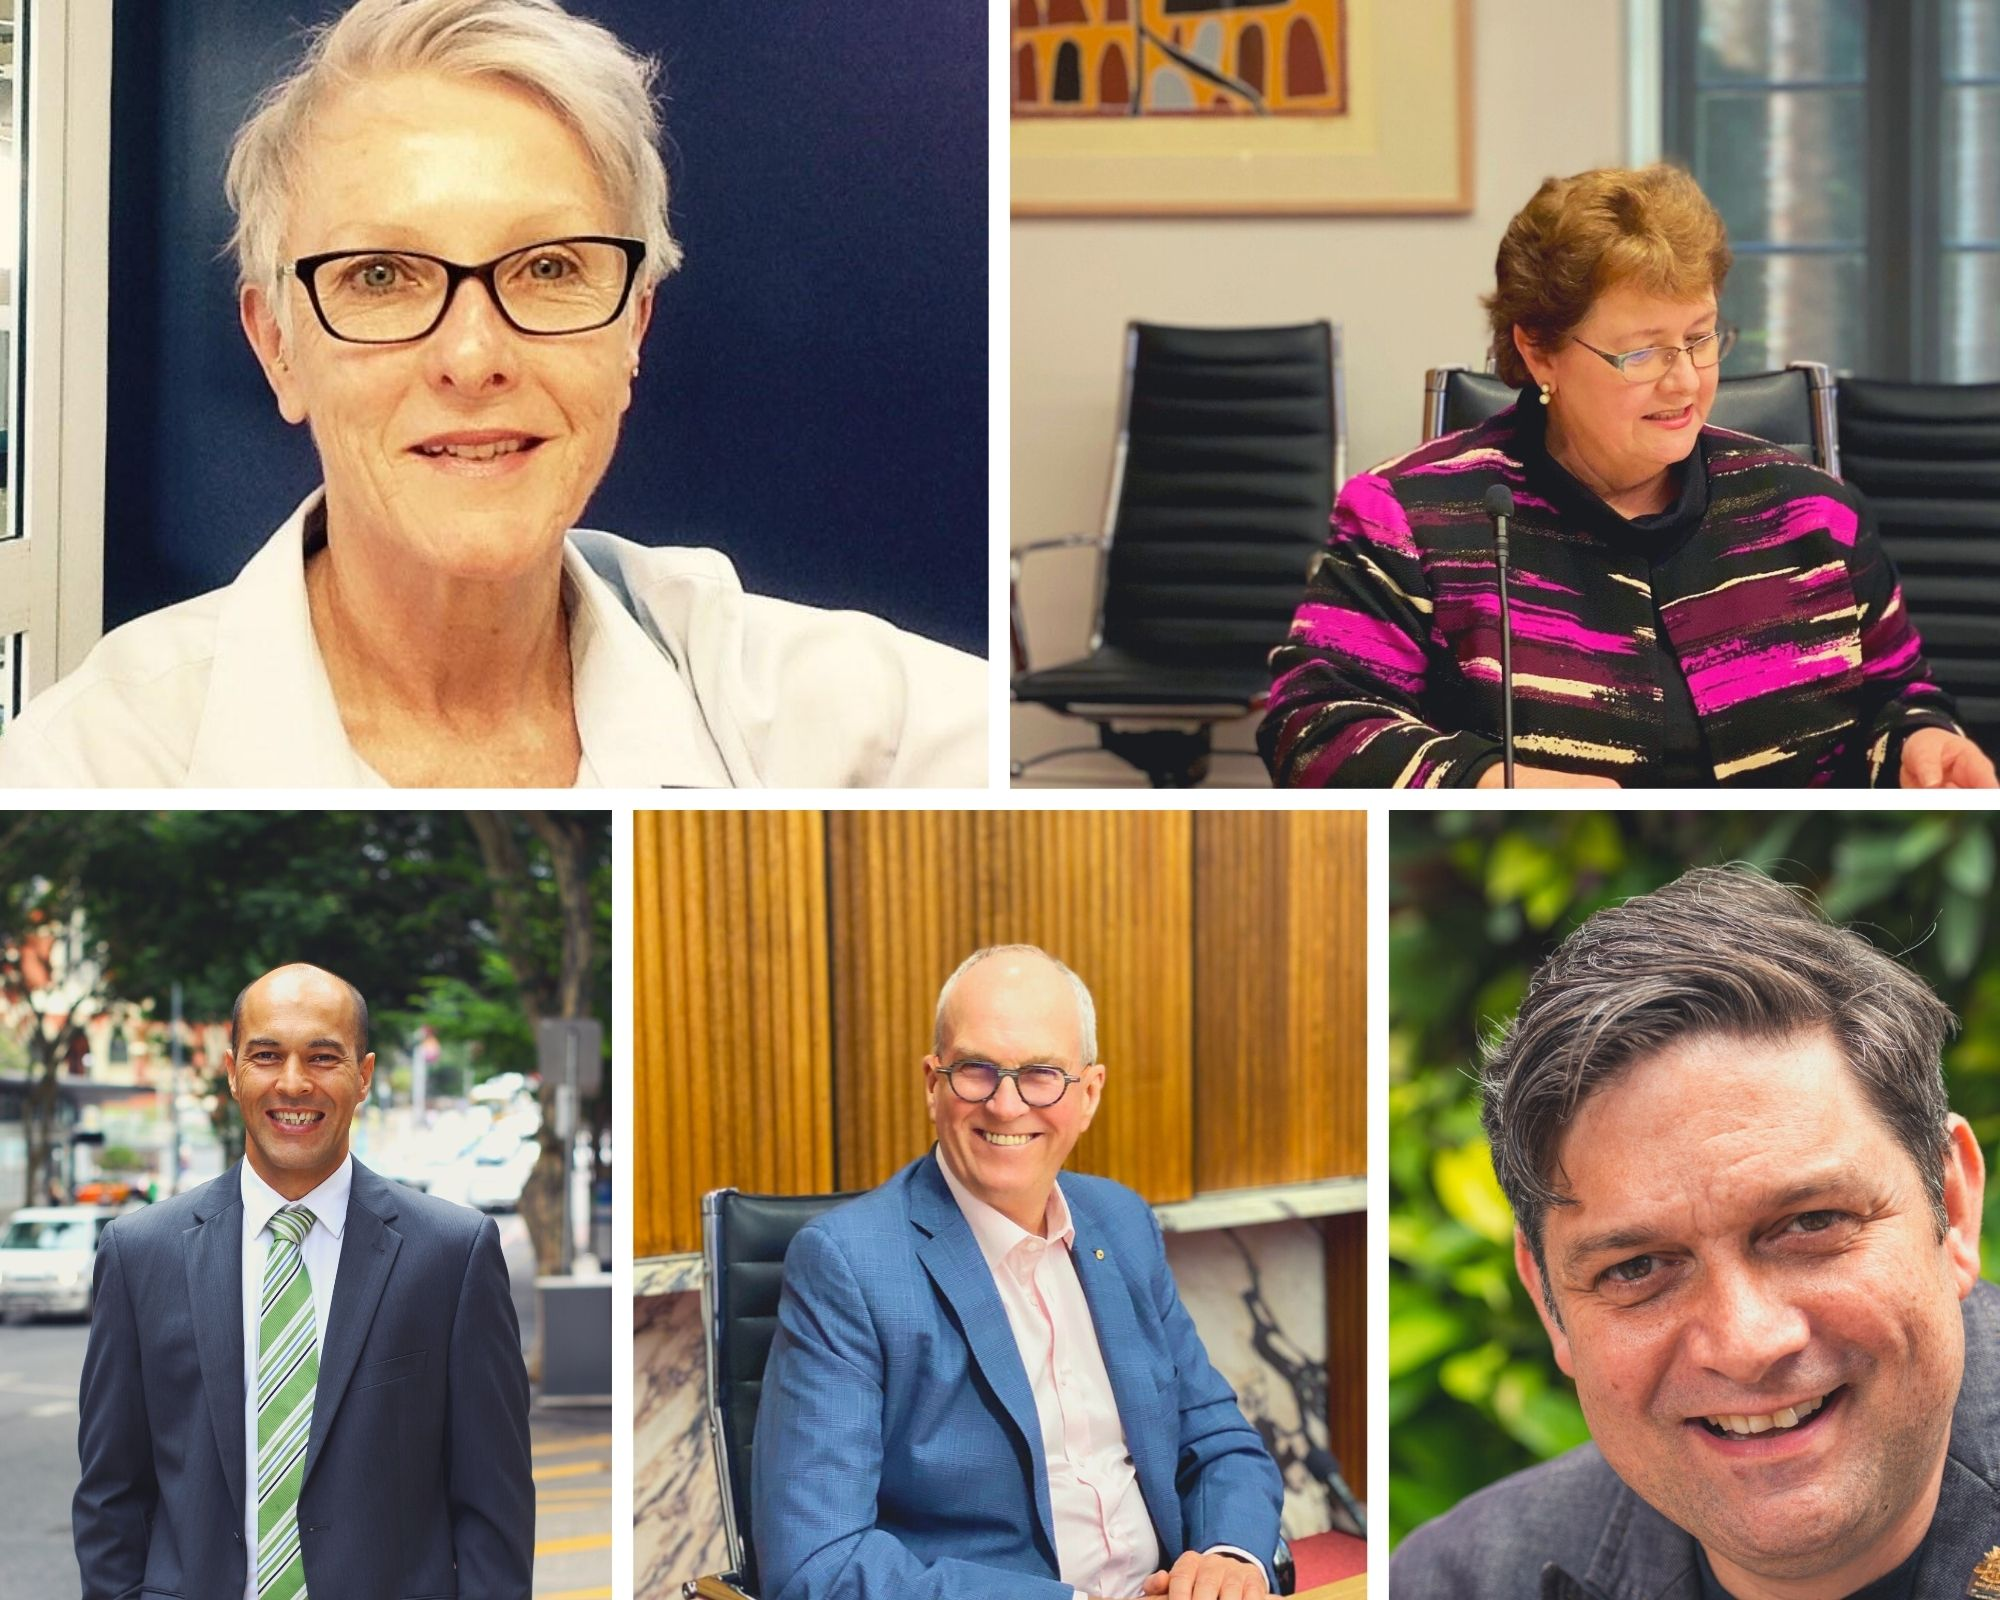 QCF 2020 Philanthropist of the Year Awards Judges